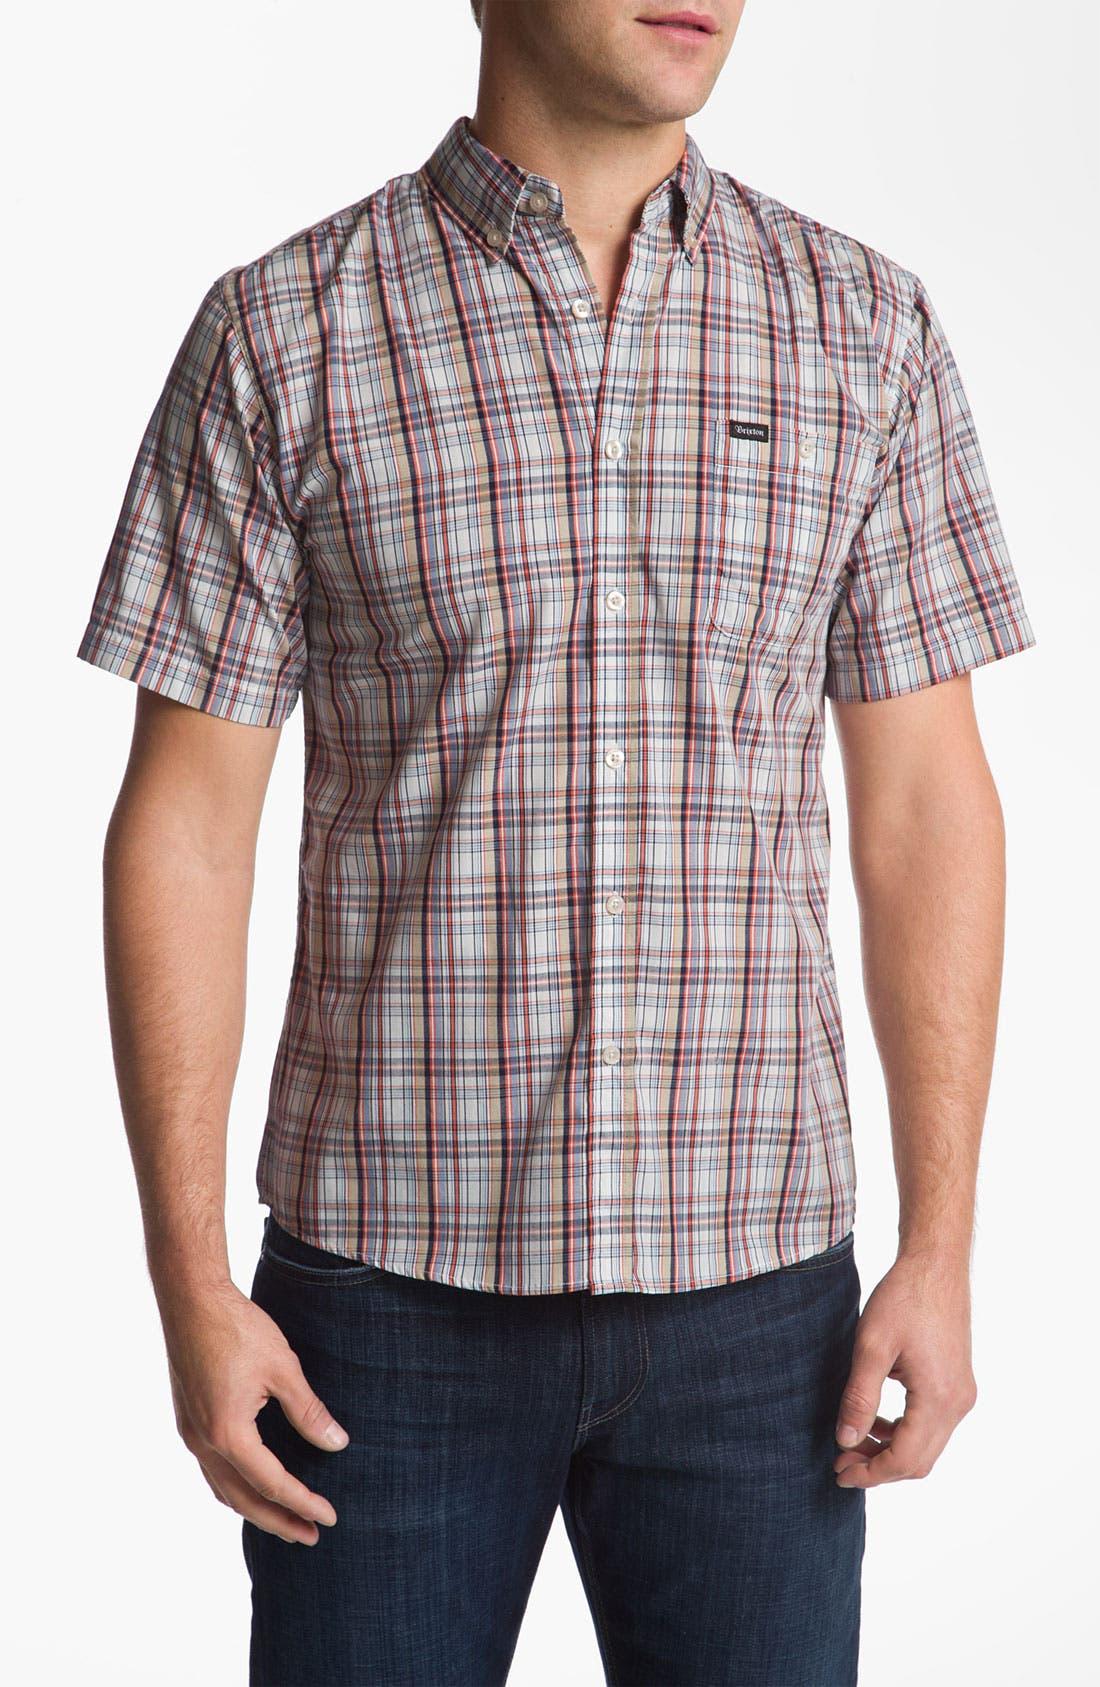 Main Image - Brixton 'Howl' Short Sleeve Woven Shirt